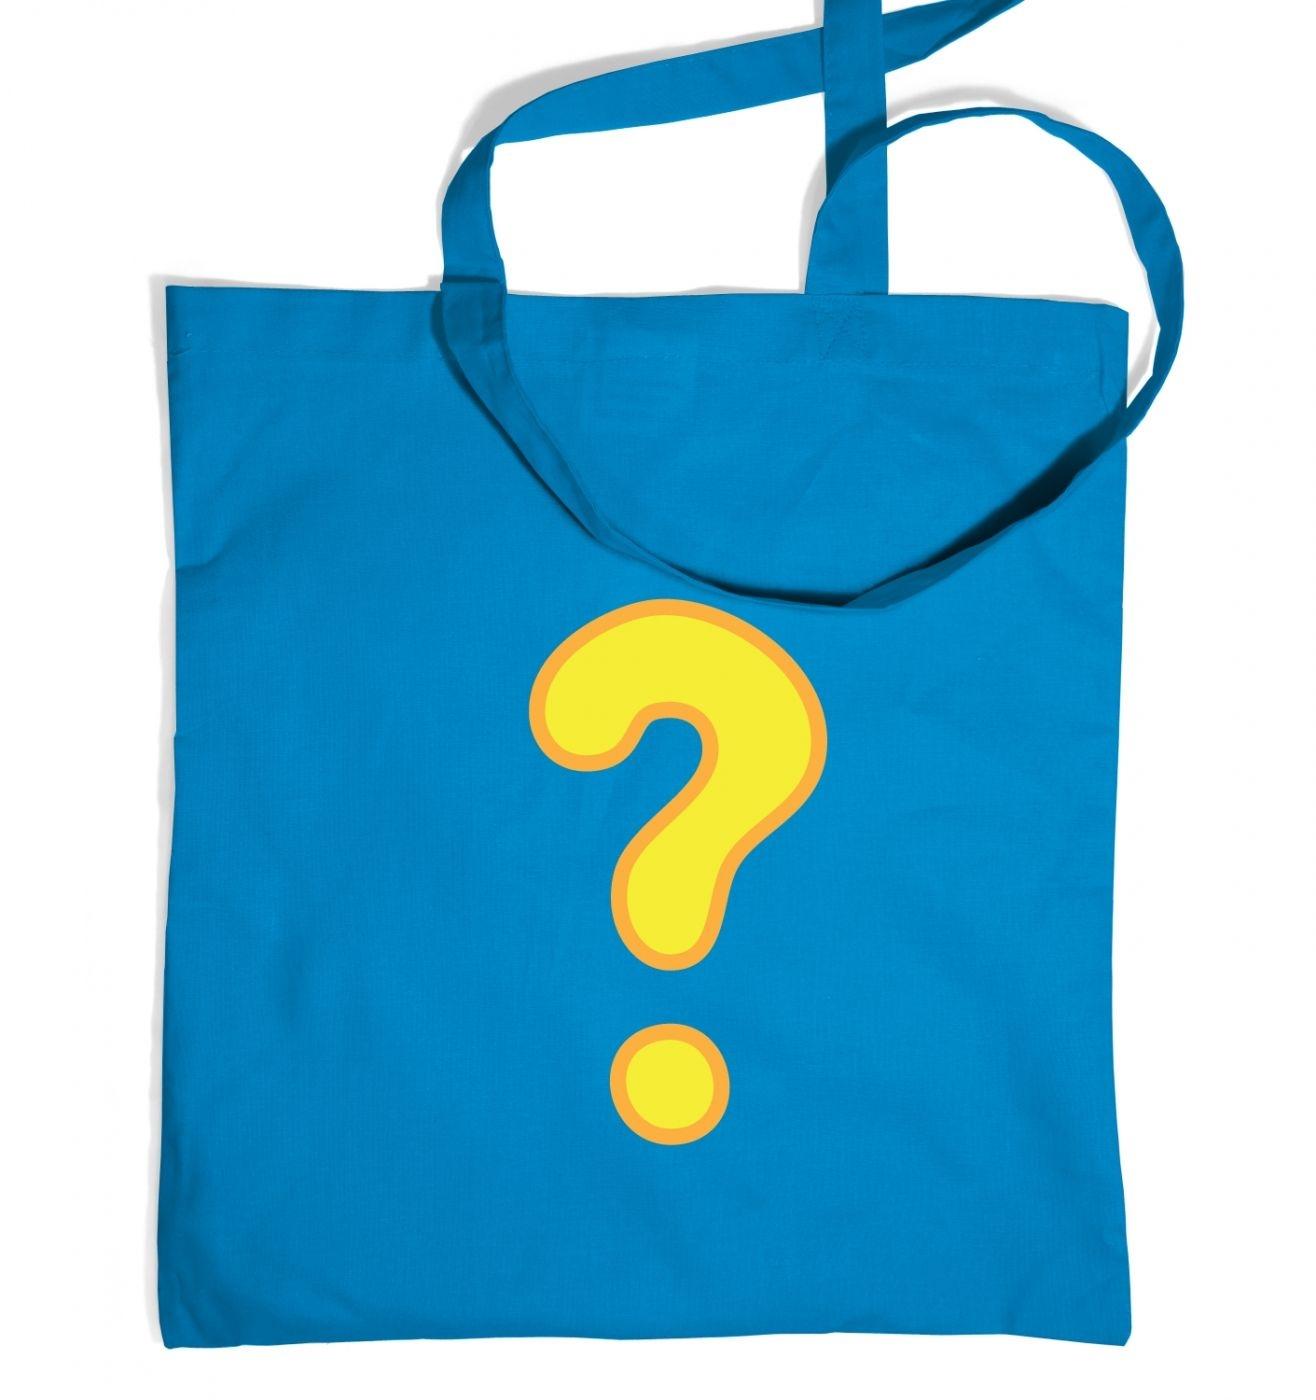 Quest Question Mark tote bag